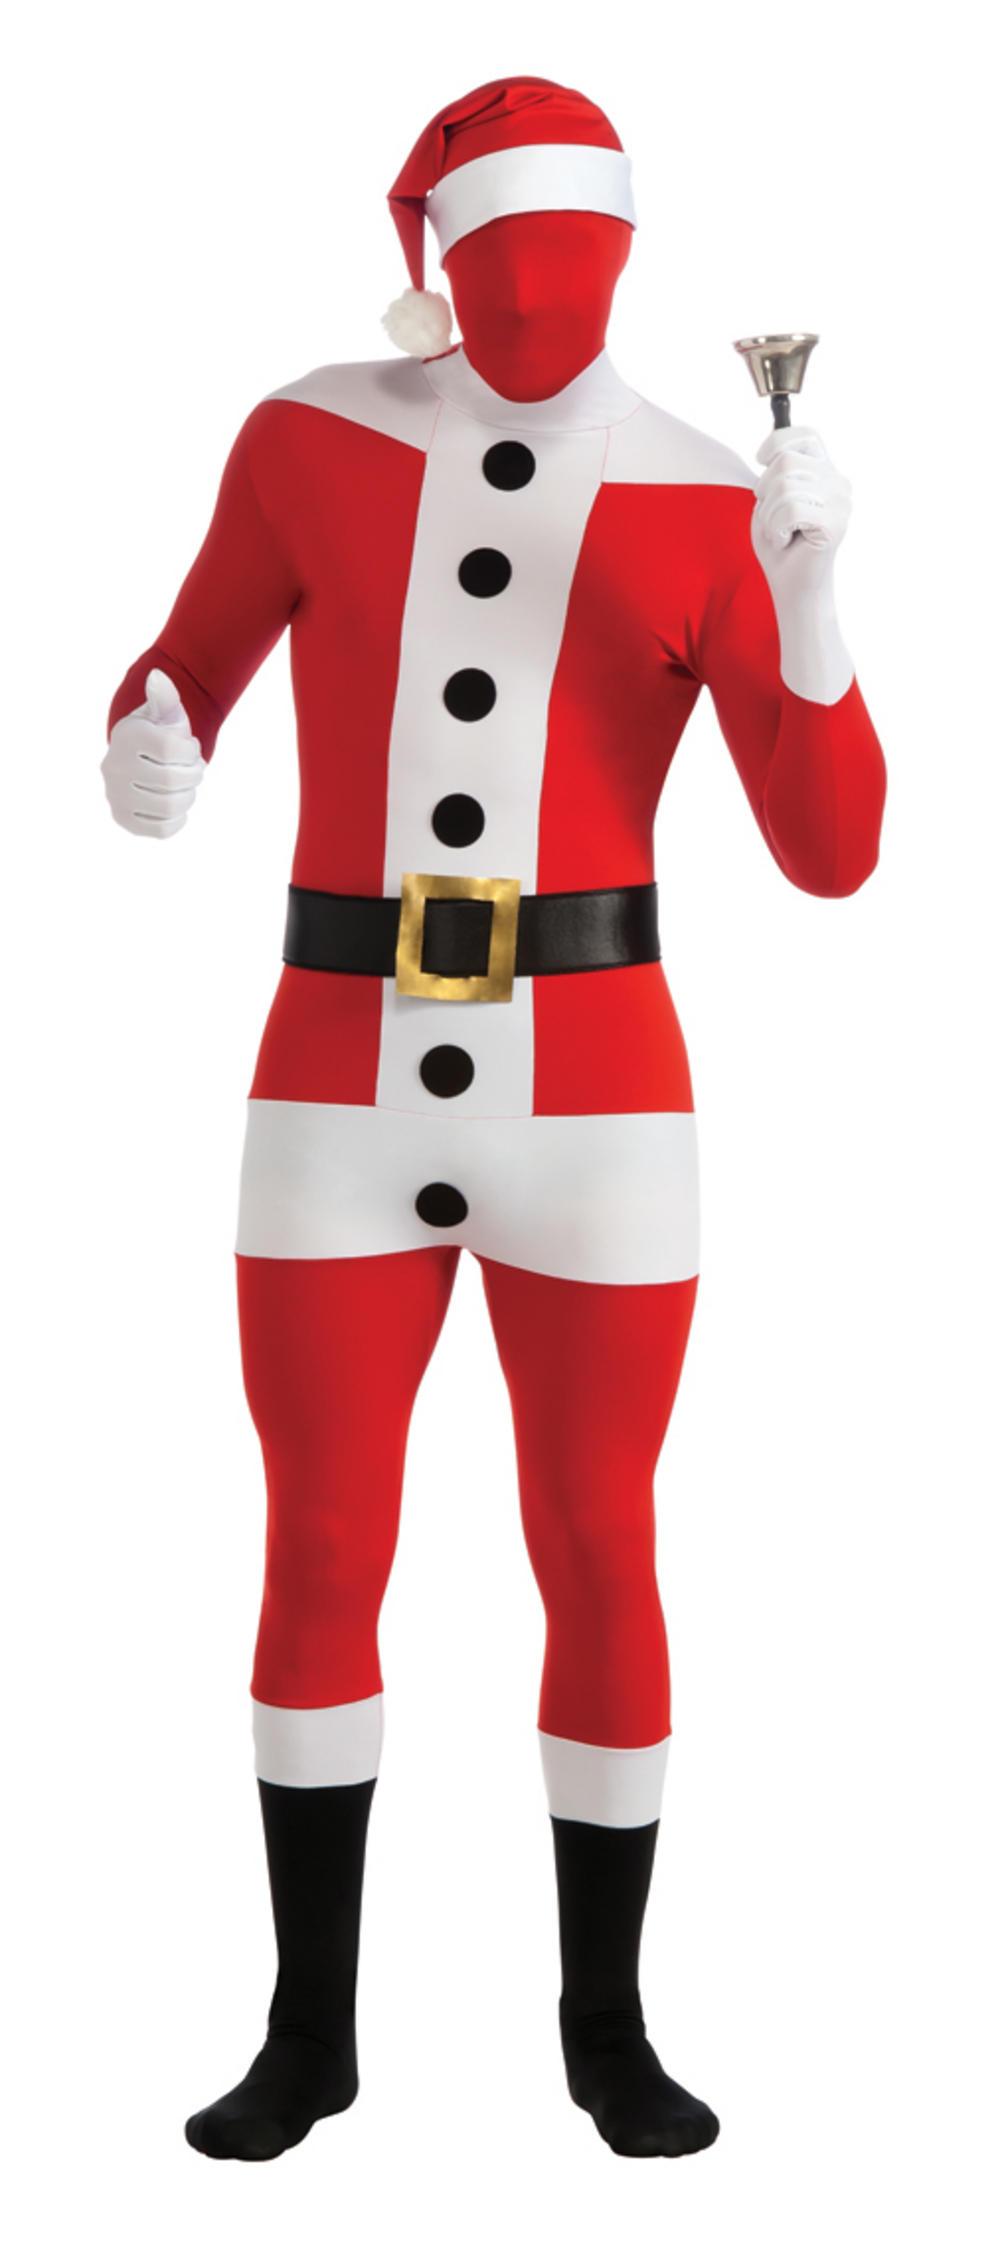 Santa Claus Second Skin Suit